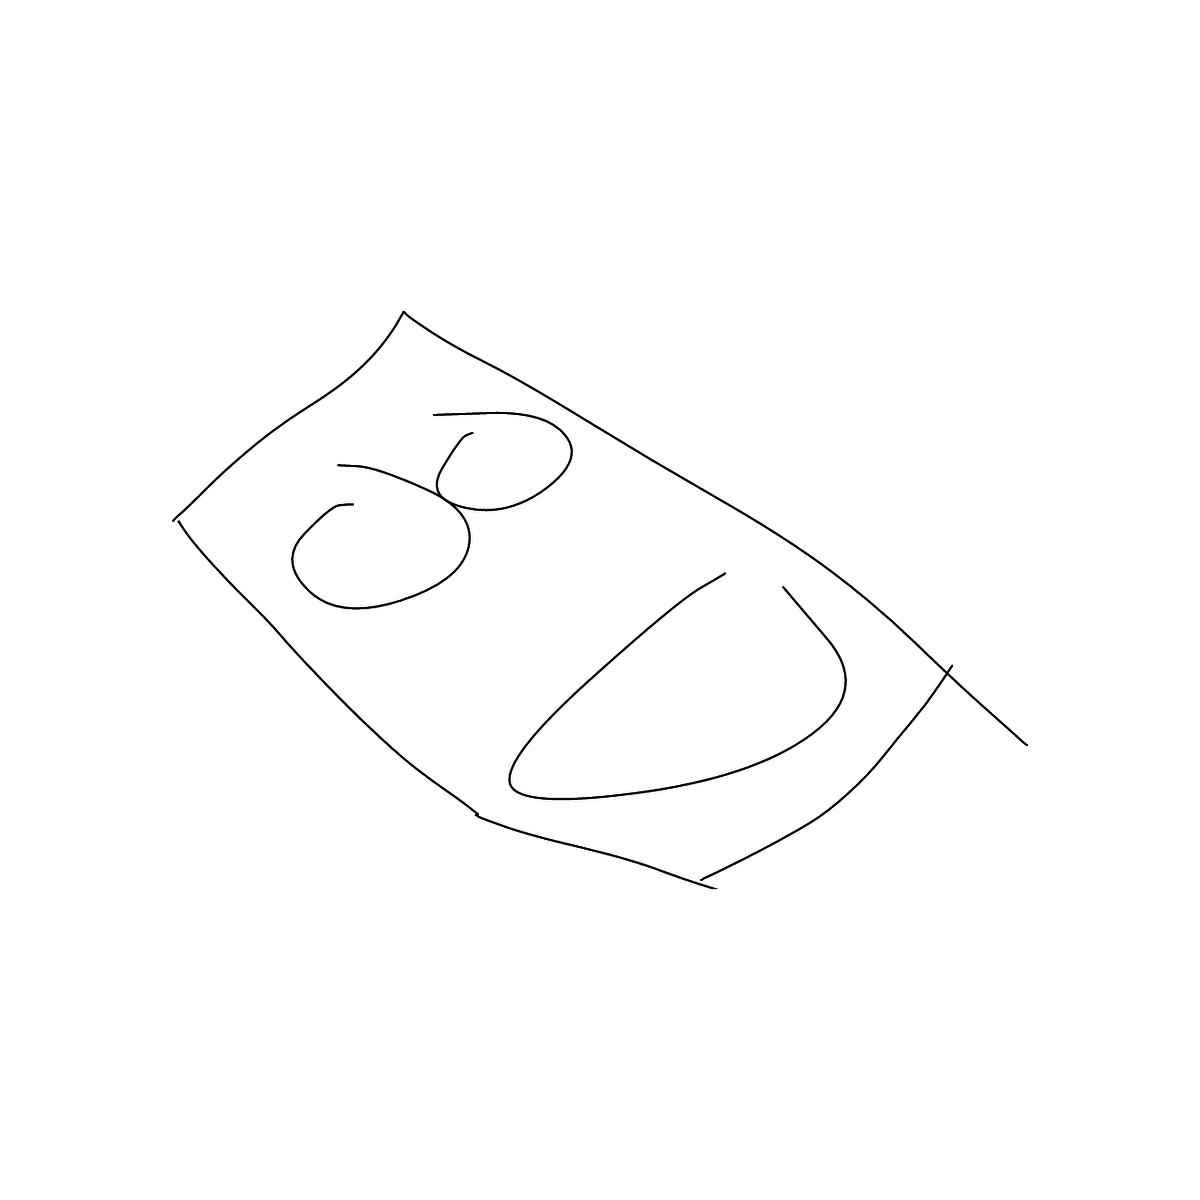 BAAAM drawing#17714 lat:55.0914993286132800lng: 24.2803897857666000